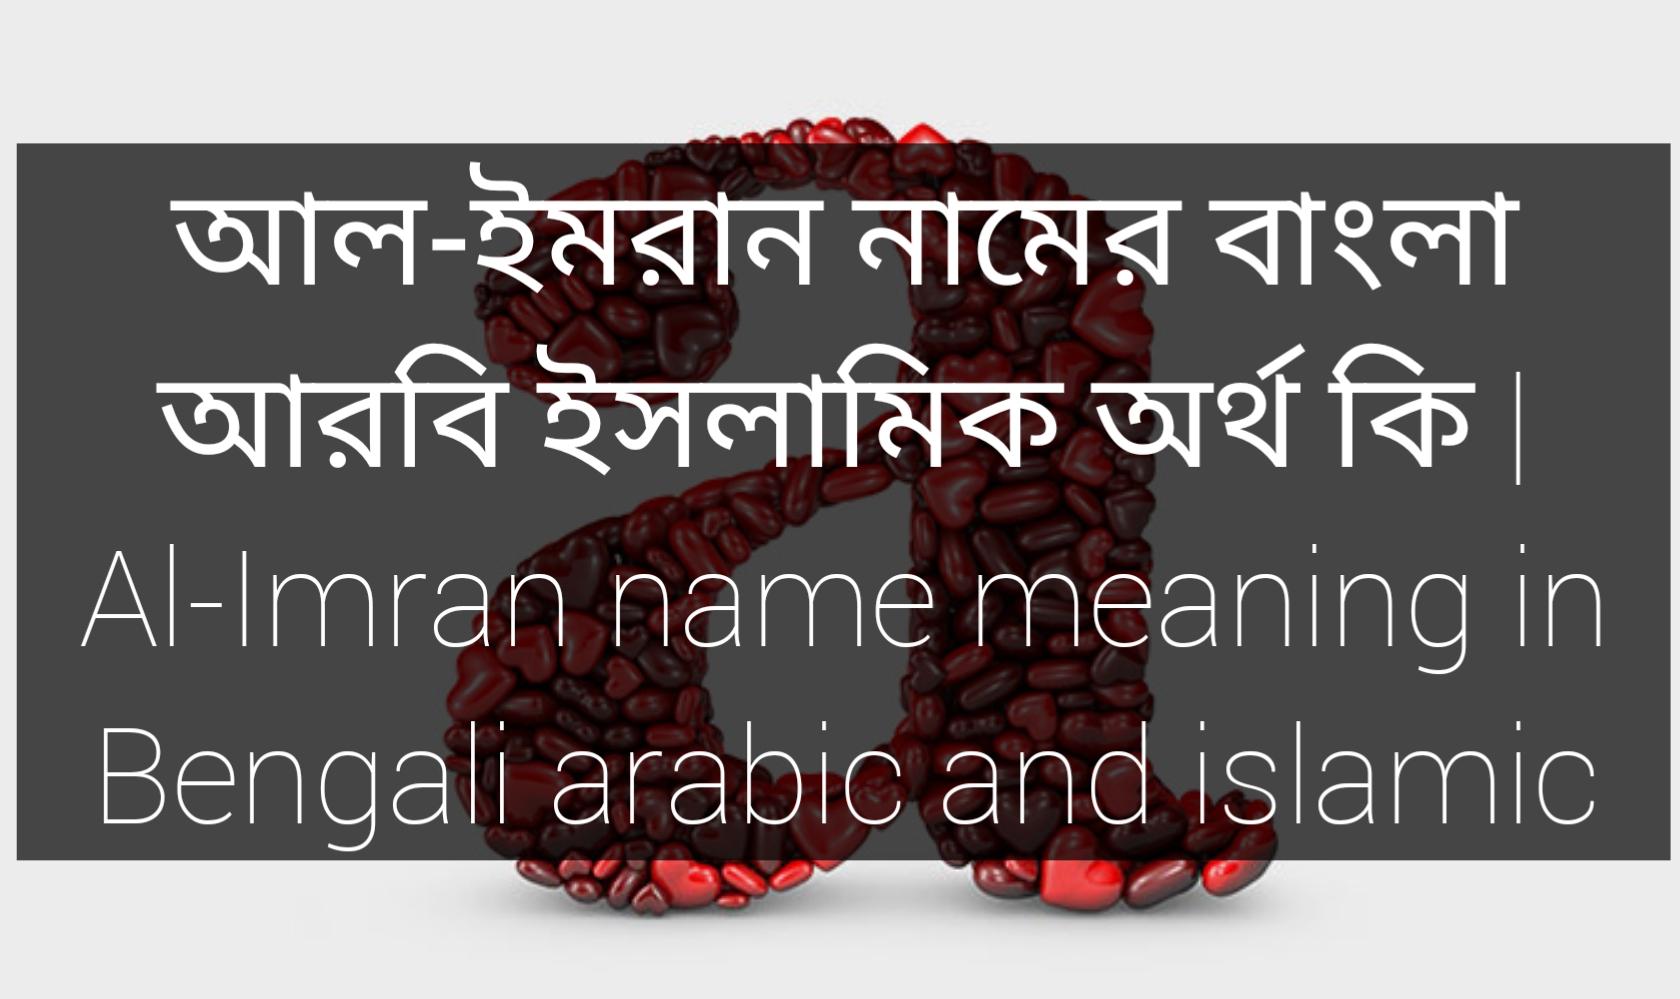 Al-imran name meaning in Bengali, আল-ইমরান নামের অর্থ কি, আল-ইমরান নামের বাংলা অর্থ কি, আল-ইমরান নামের ইসলামিক অর্থ কি,